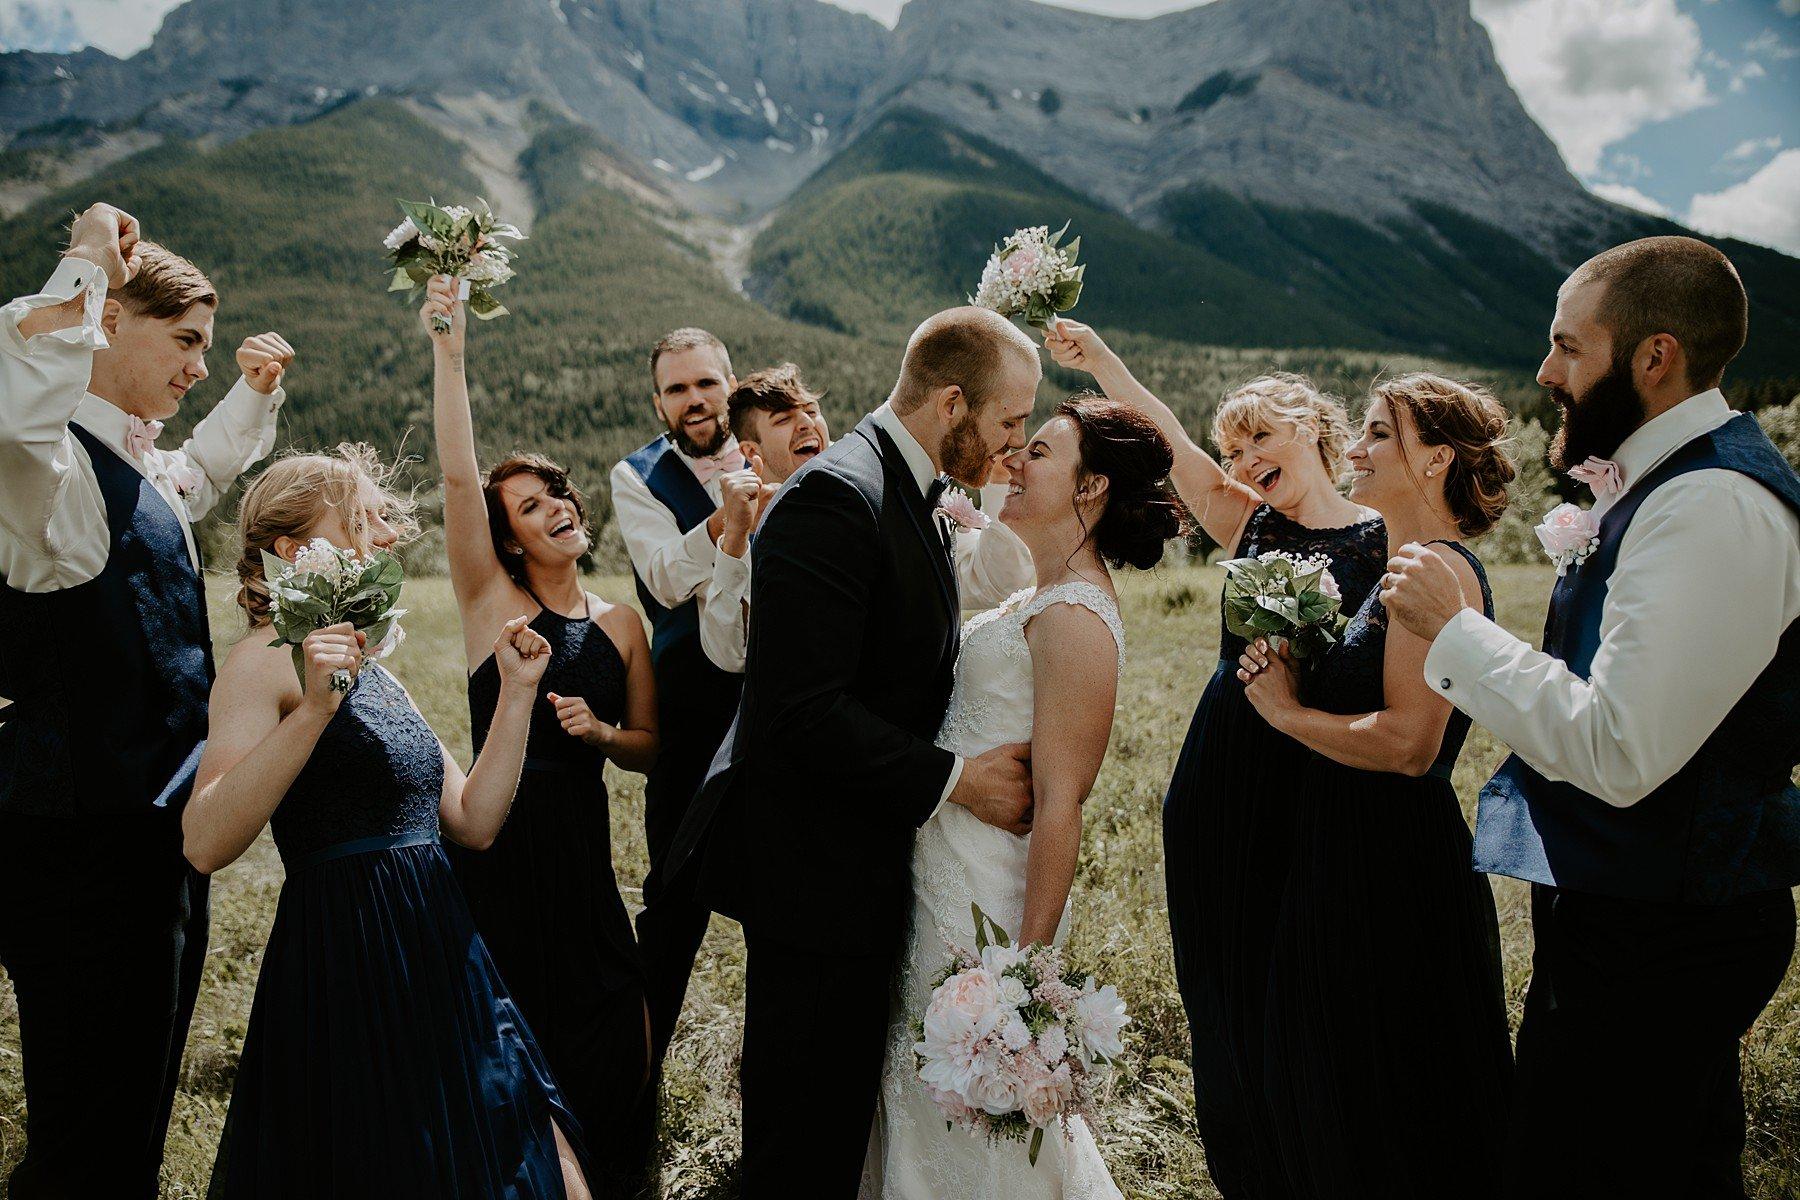 Cornerstone Theatre Wedding - Calgary wedding photographers Quarry Lake Park Wedding